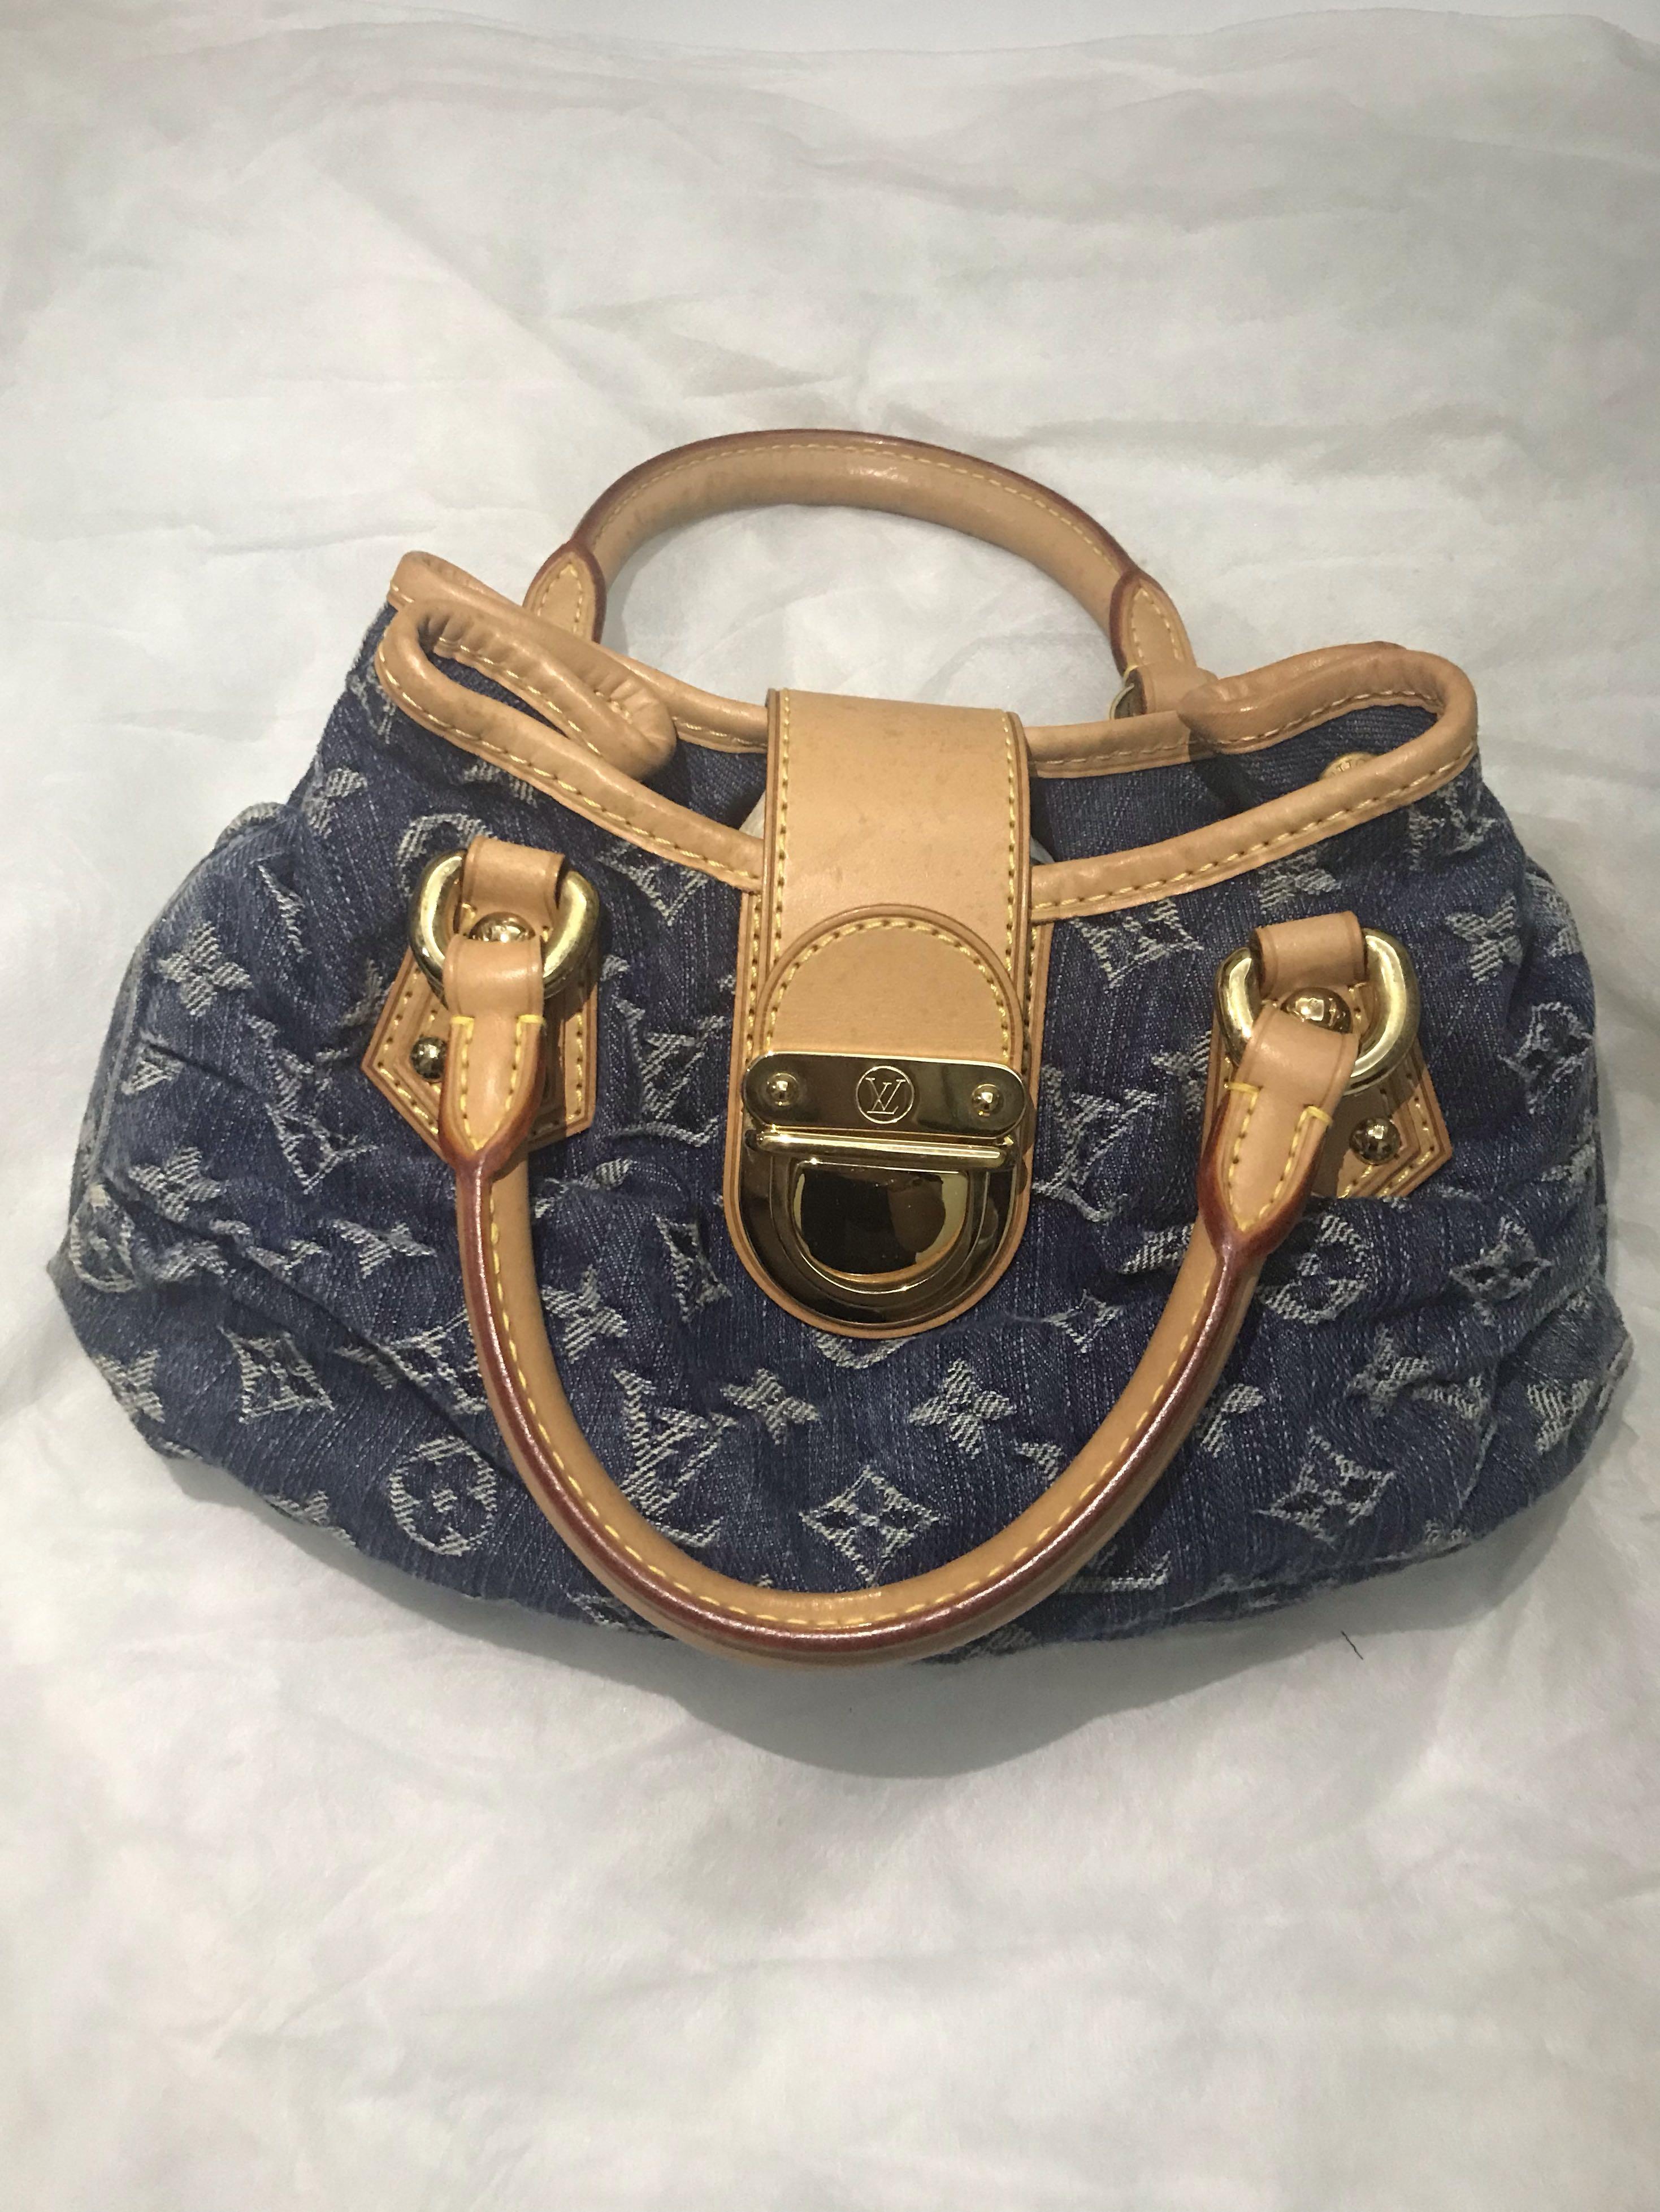 a3d83381d4 Home · Women s Fashion · Bags   Wallets · Handbags. photo photo ...